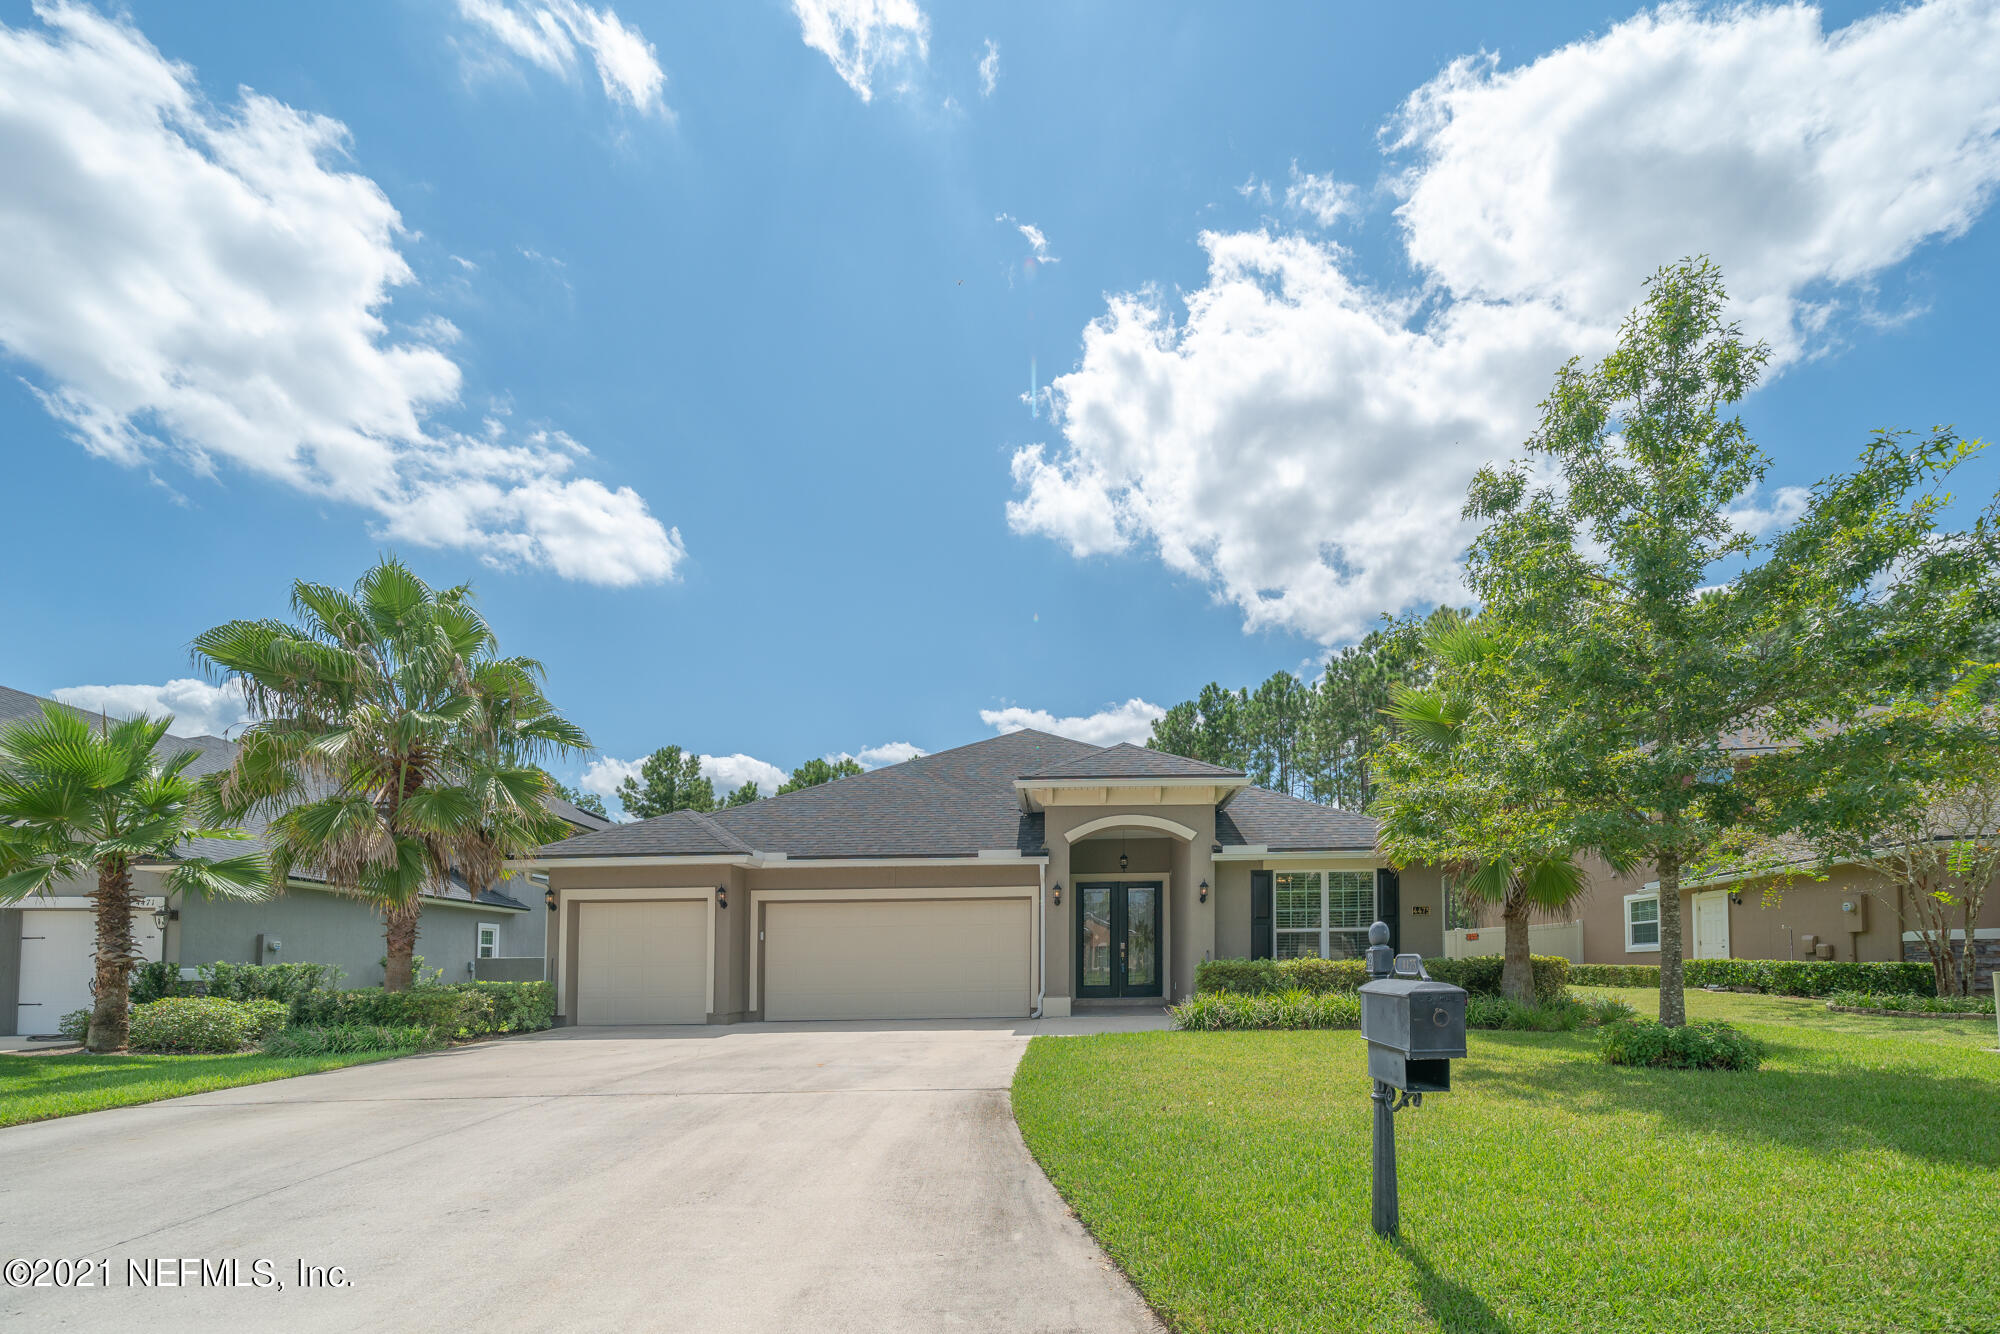 4475 QUAIL HOLLOW, ORANGE PARK, FLORIDA 32065, 4 Bedrooms Bedrooms, ,3 BathroomsBathrooms,Residential,For sale,QUAIL HOLLOW,1129980